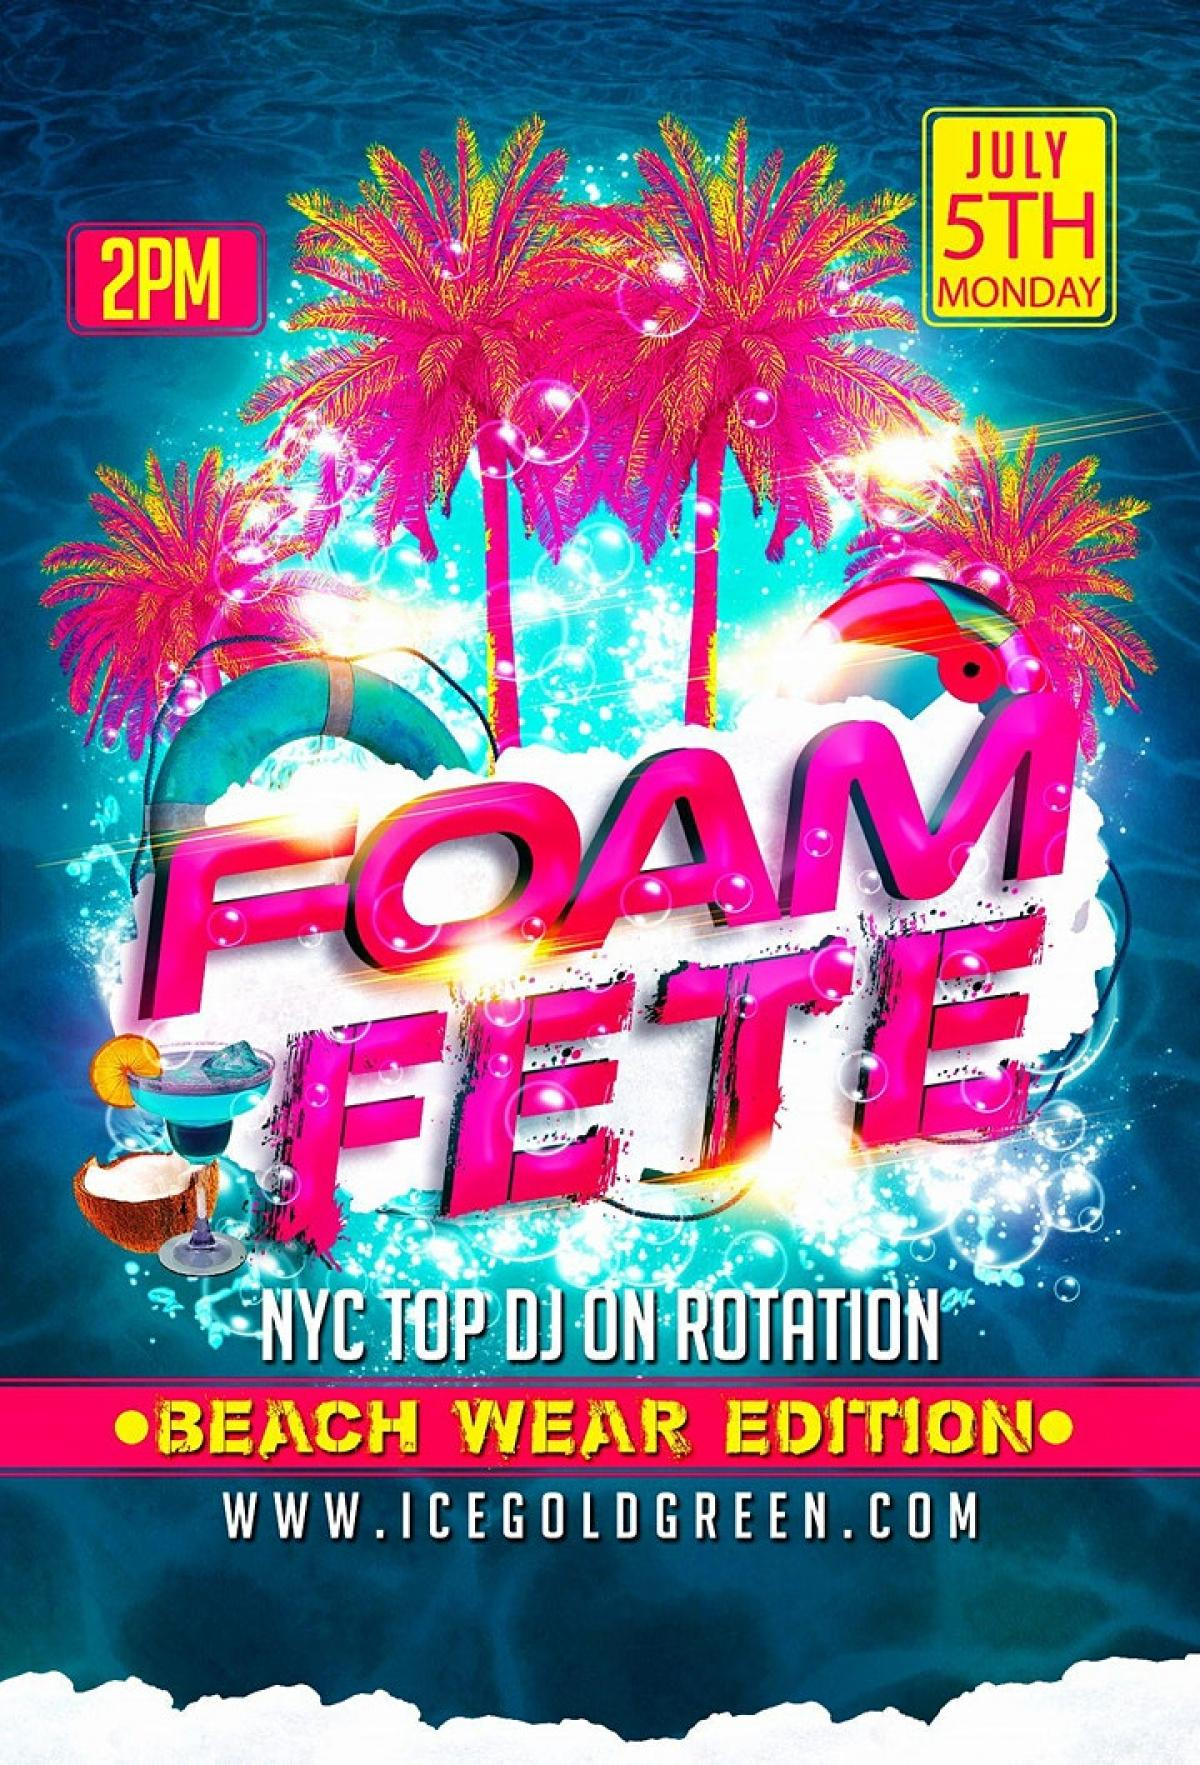 Foam Fete flyer or graphic.